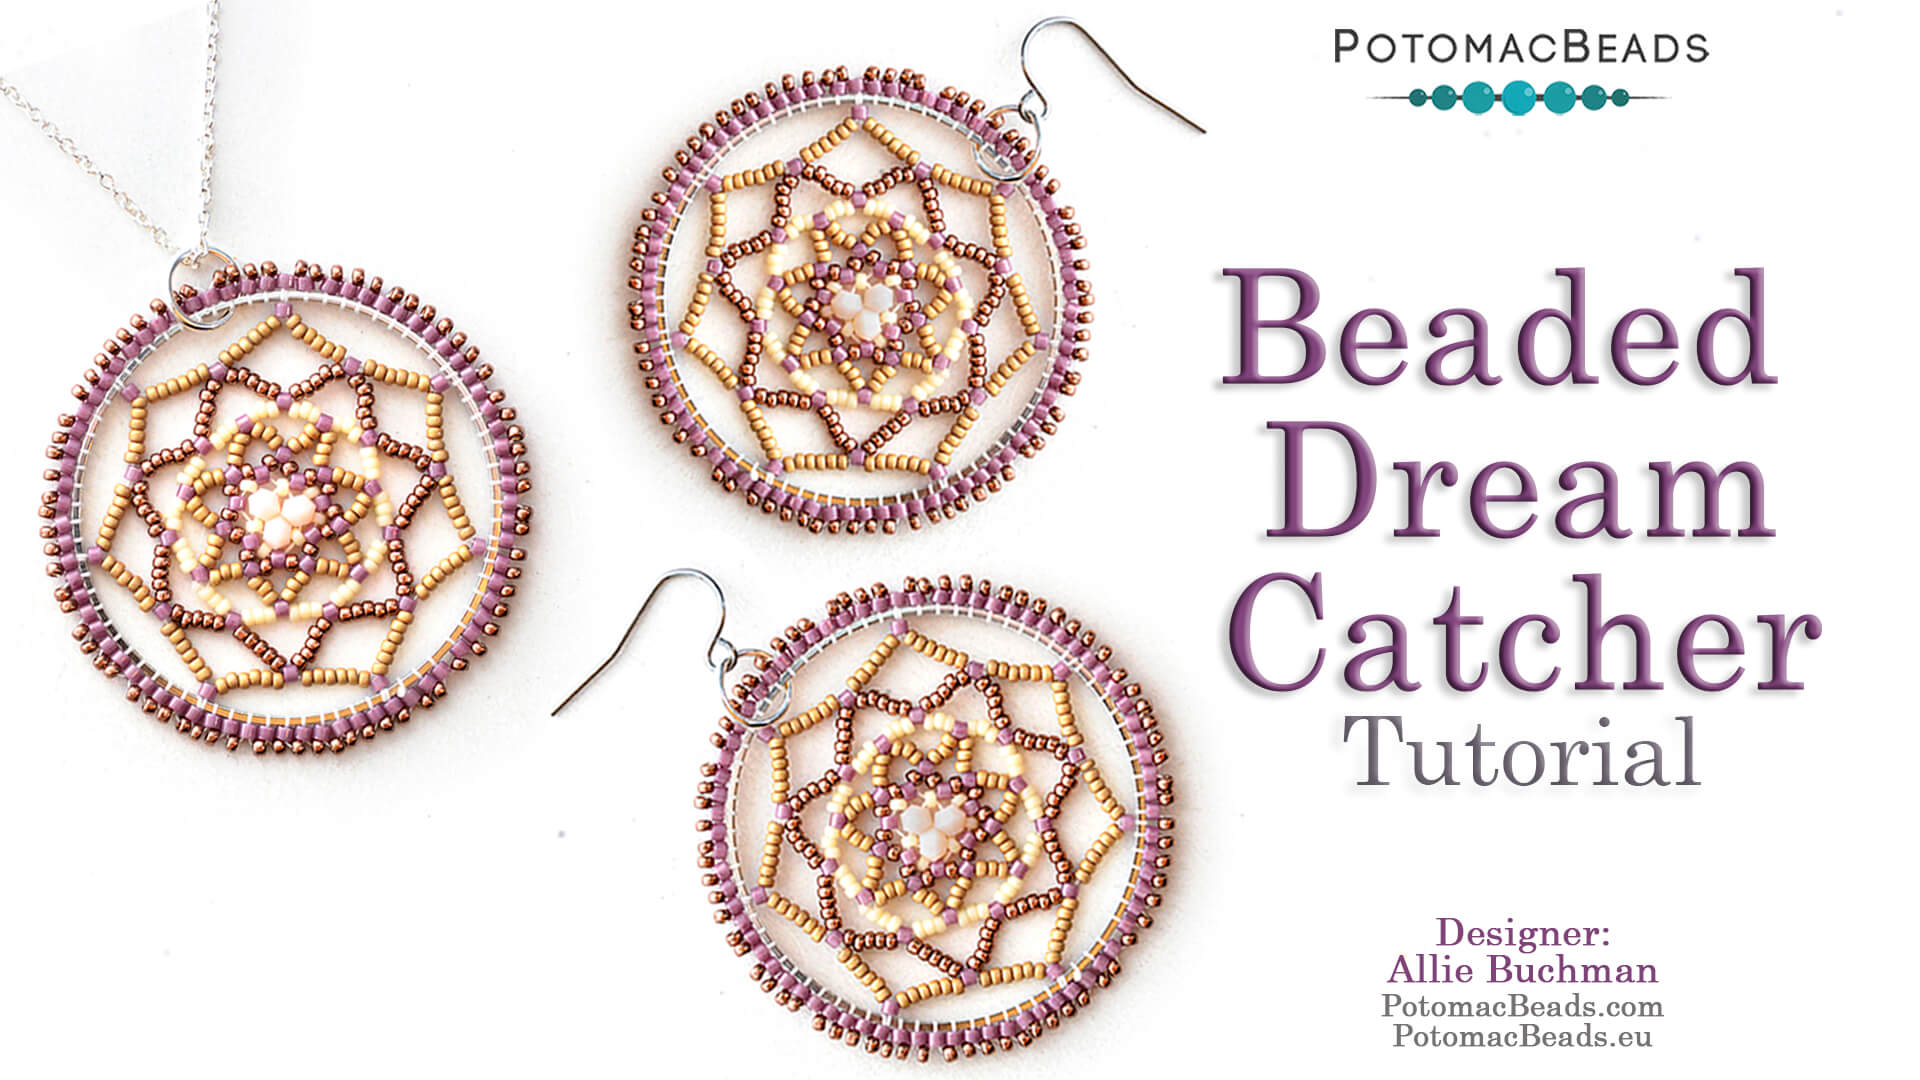 How to Bead Jewelry / Beading Tutorials & Jewel Making Videos / Bead Weaving Tutorials & Necklace Tutorial / Beaded Dream Catcher Tutorial